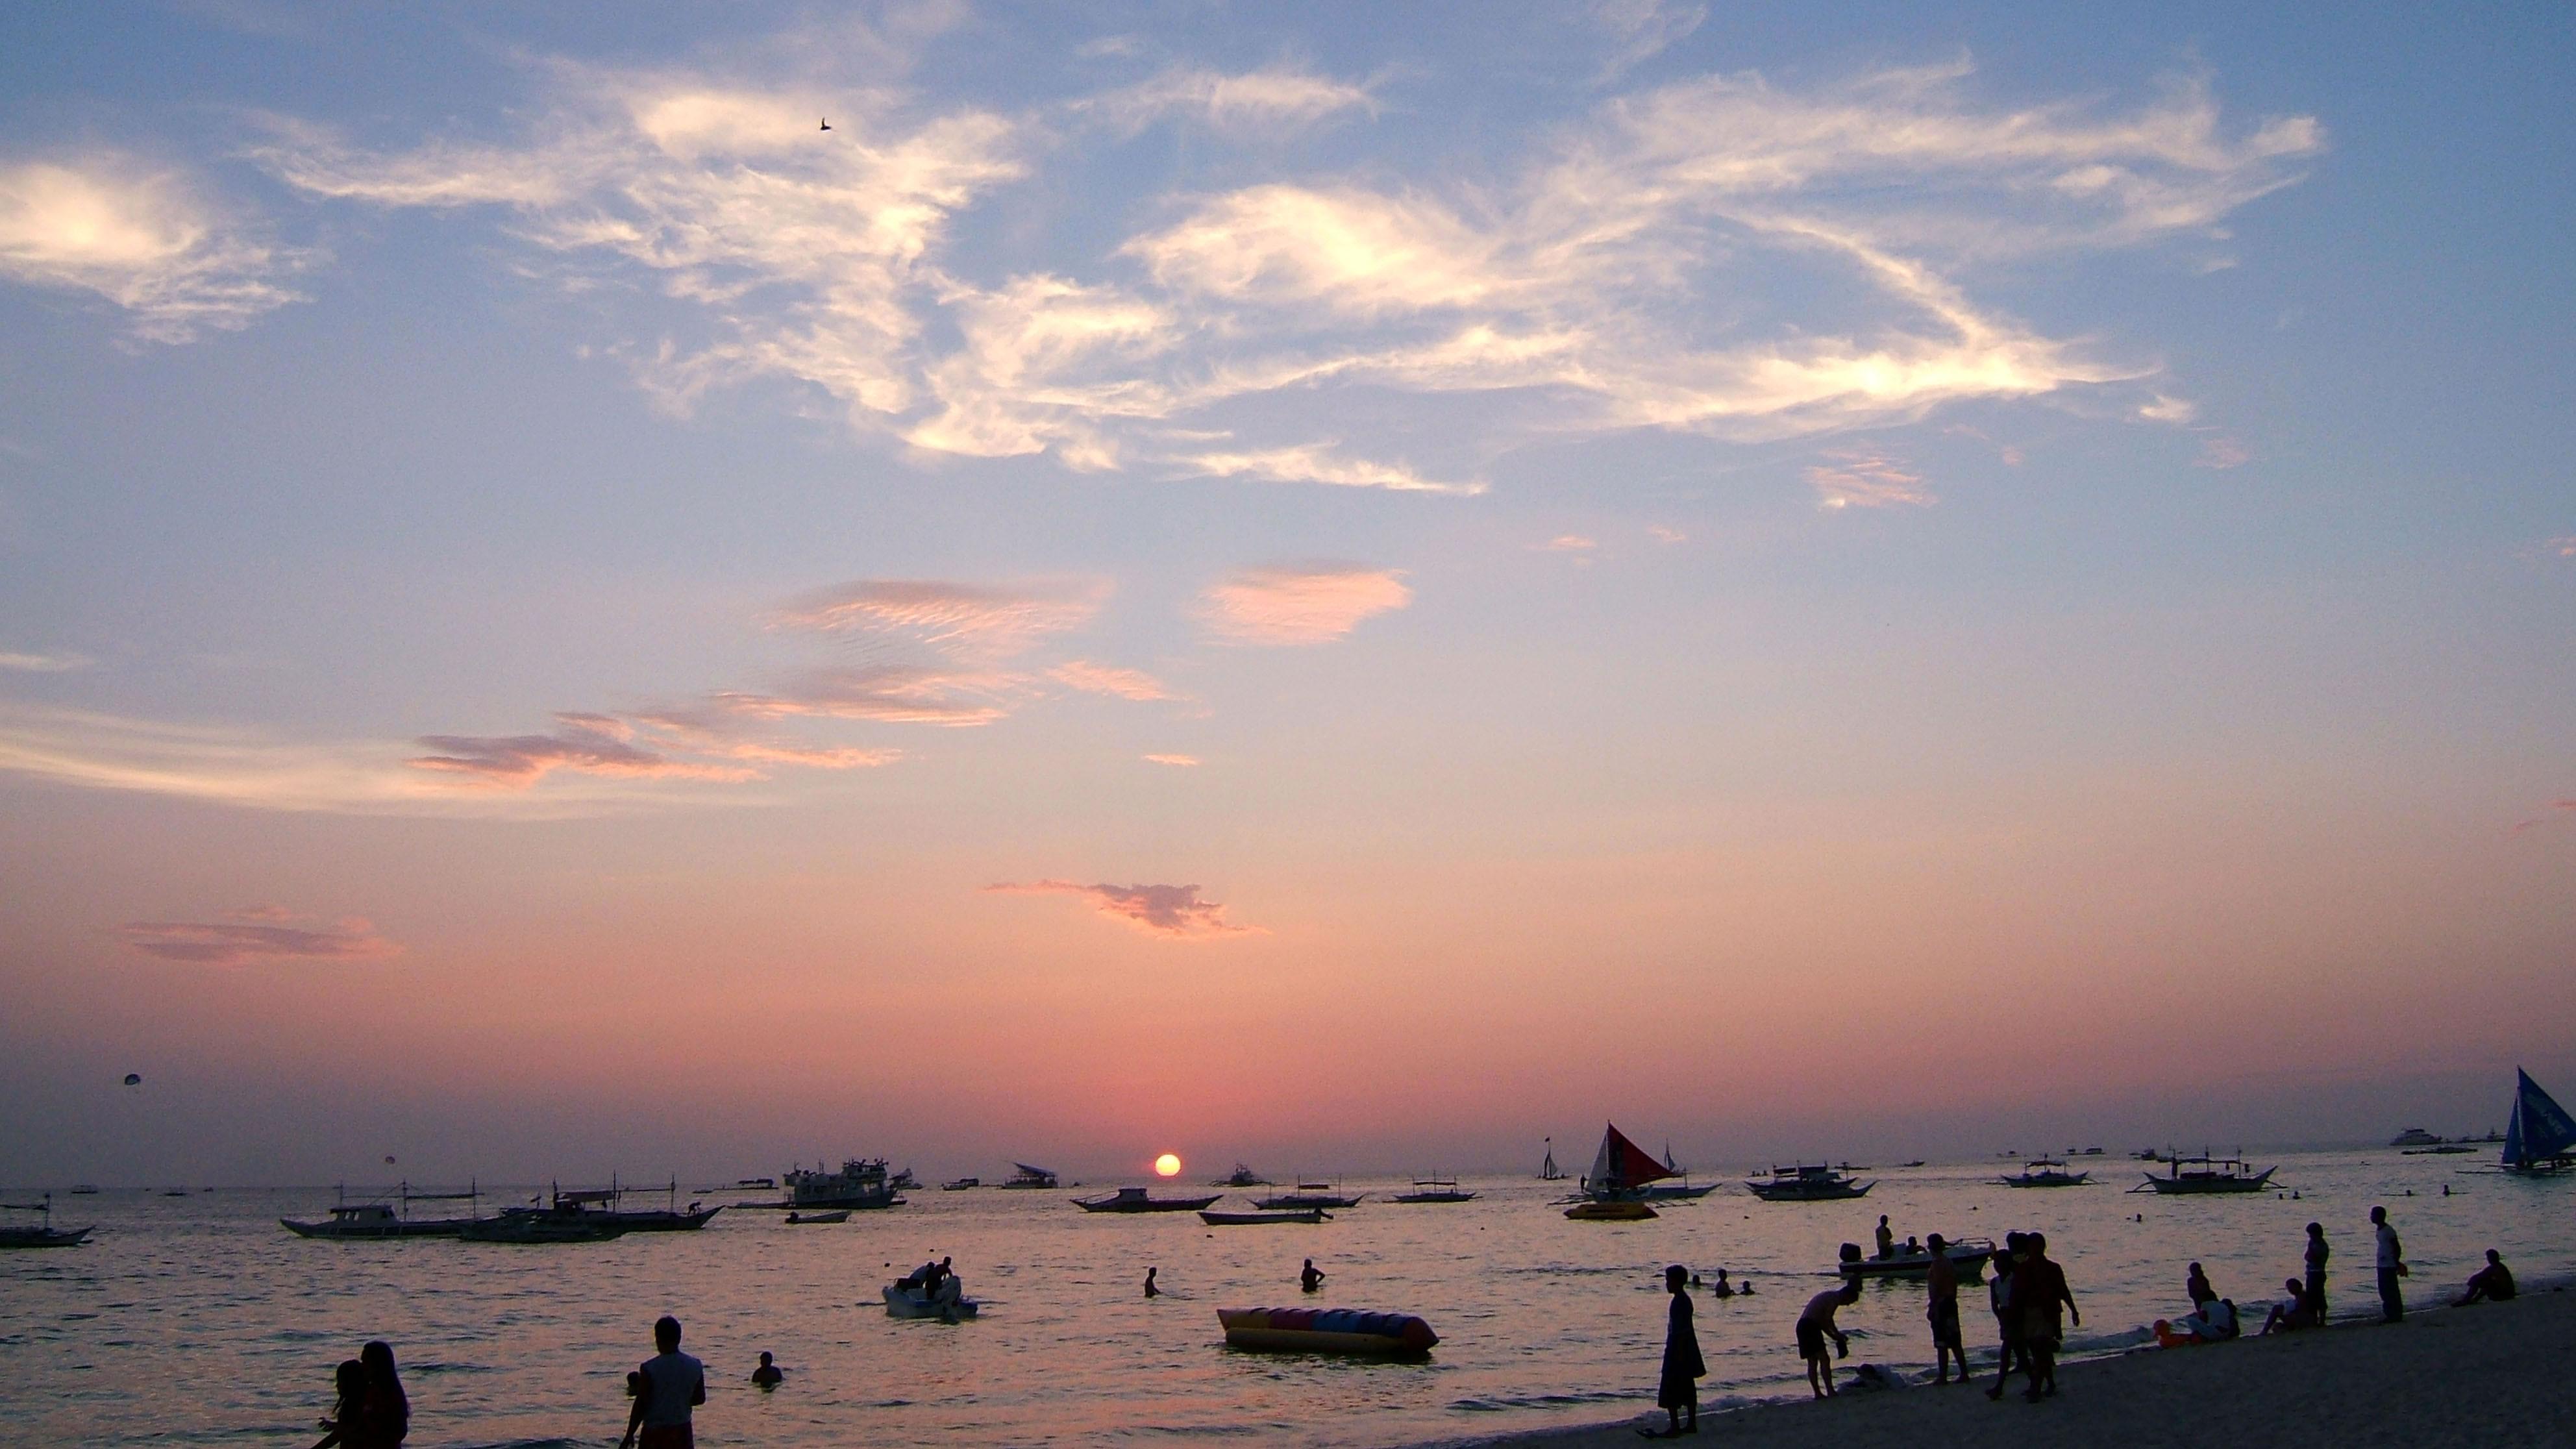 Philippines Panay Negros Caticlan Boracay White Beach Sunset Dec 2003 13